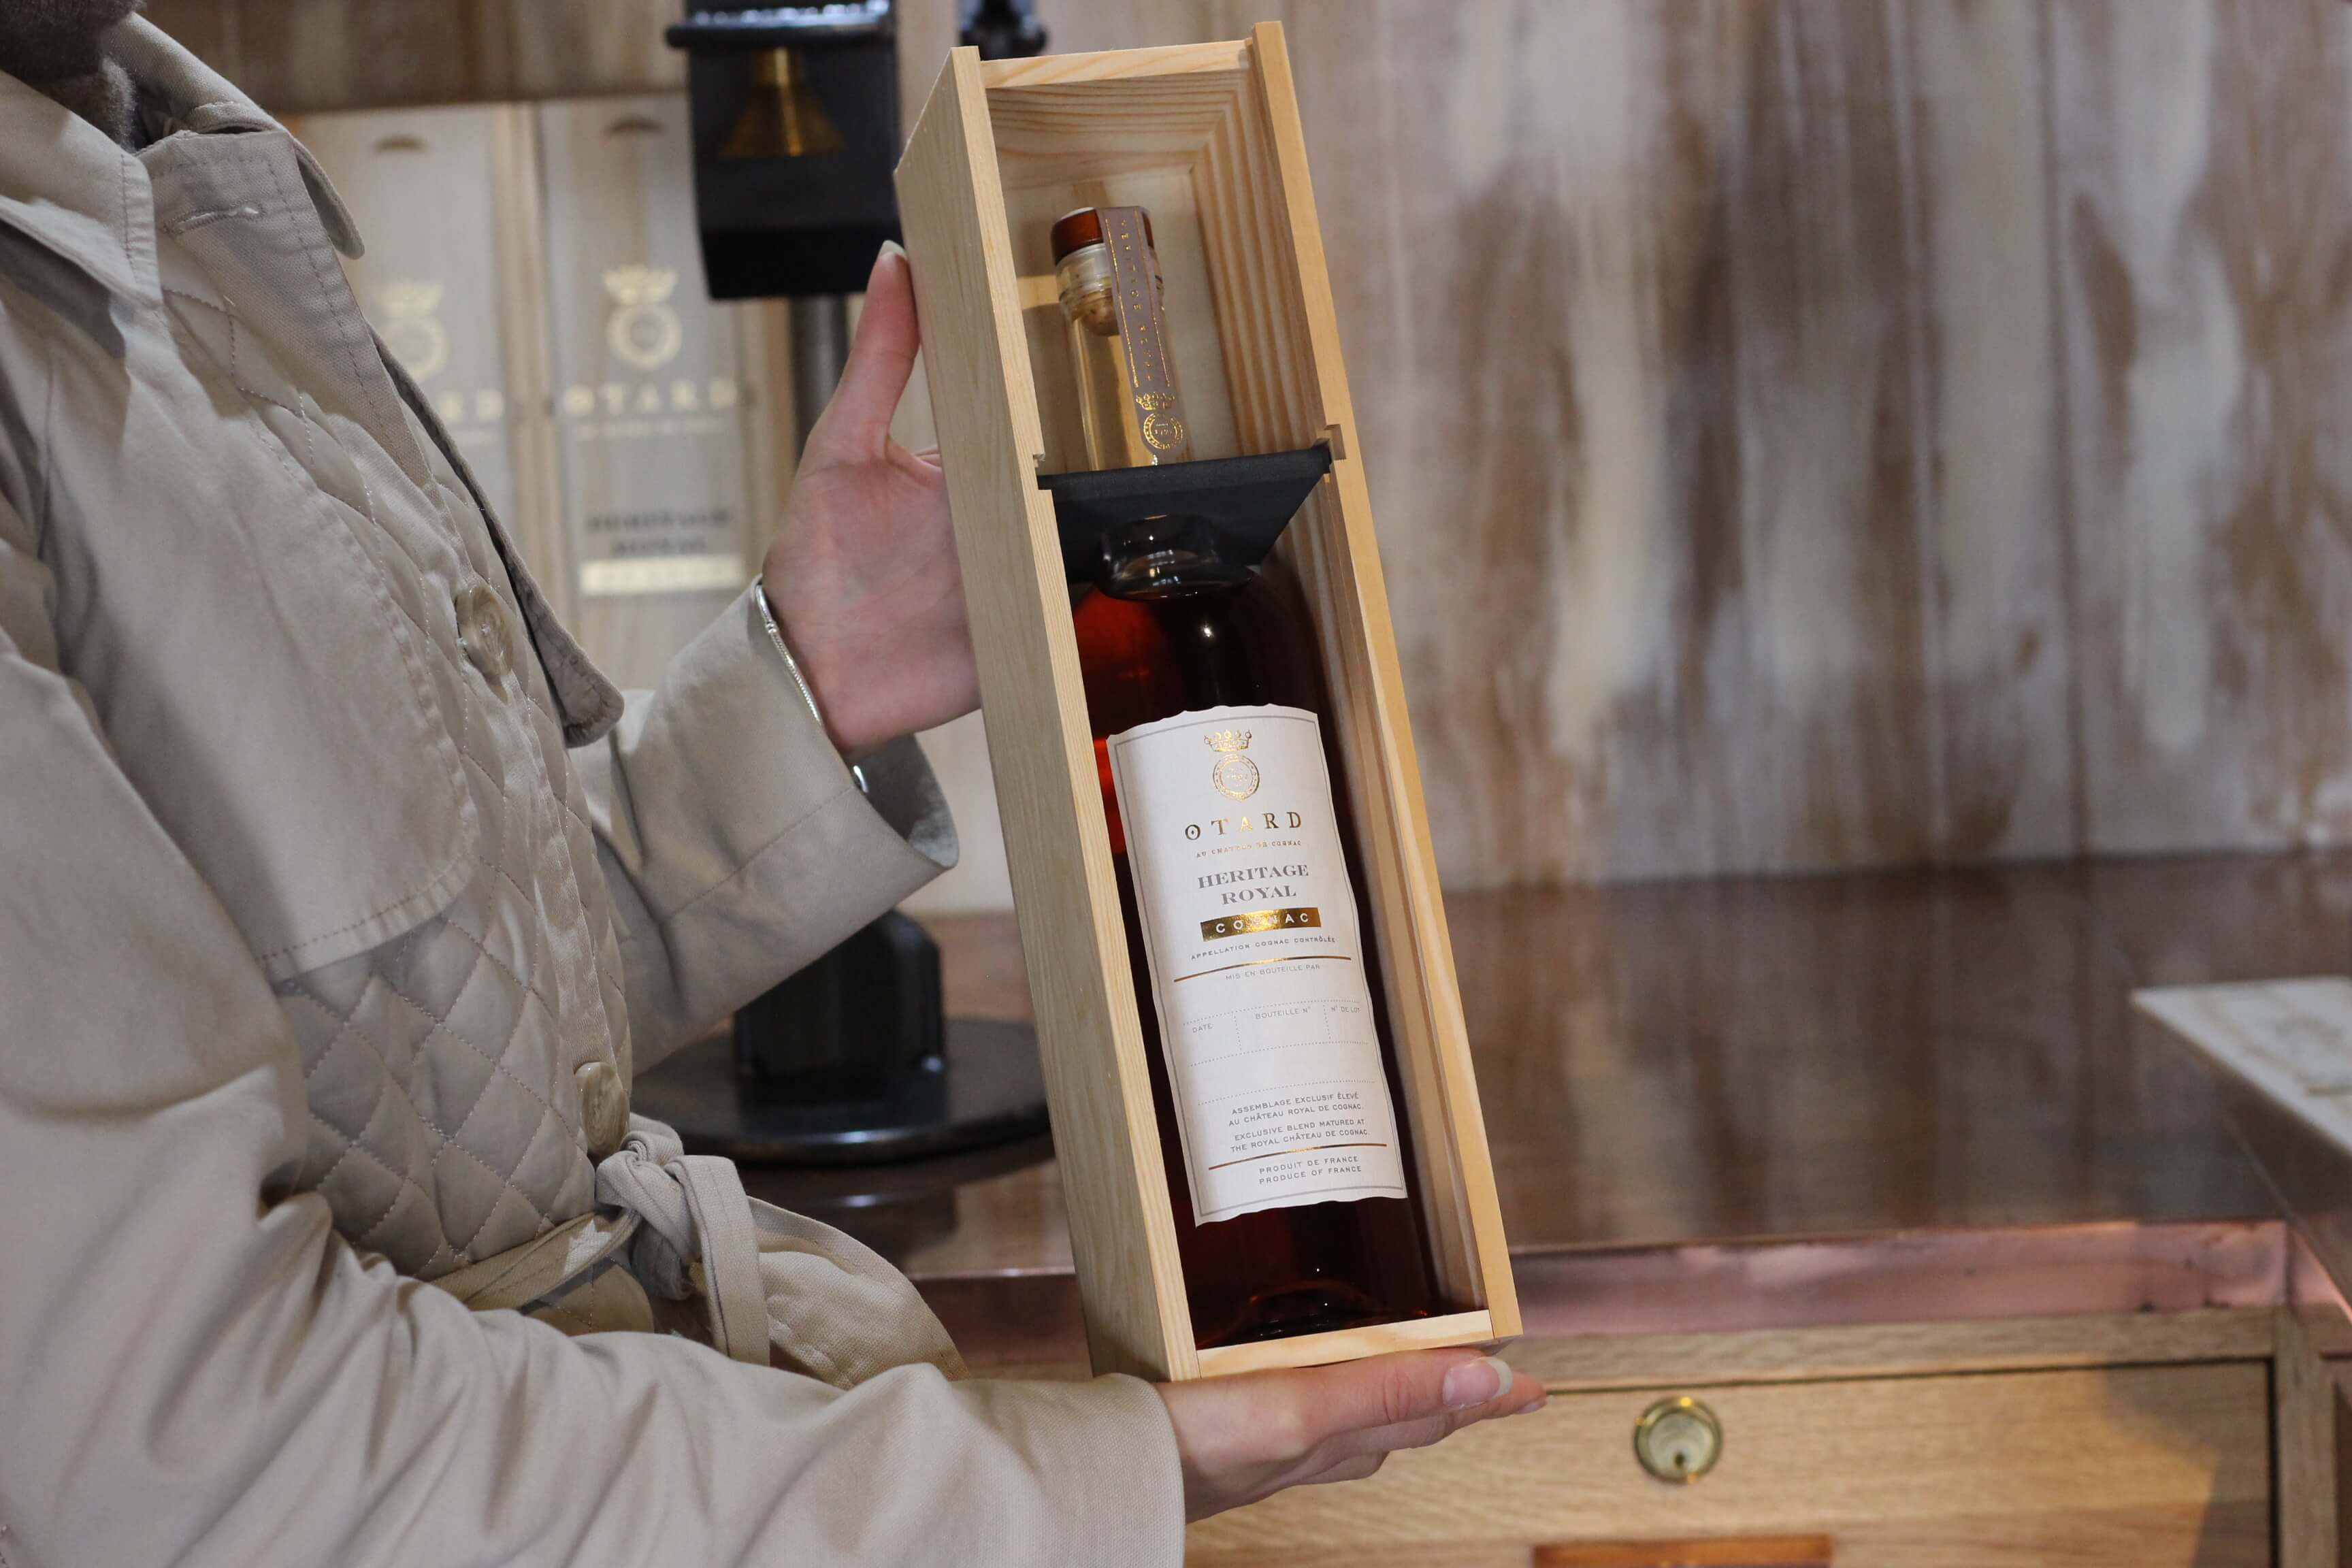 baron otard bottle